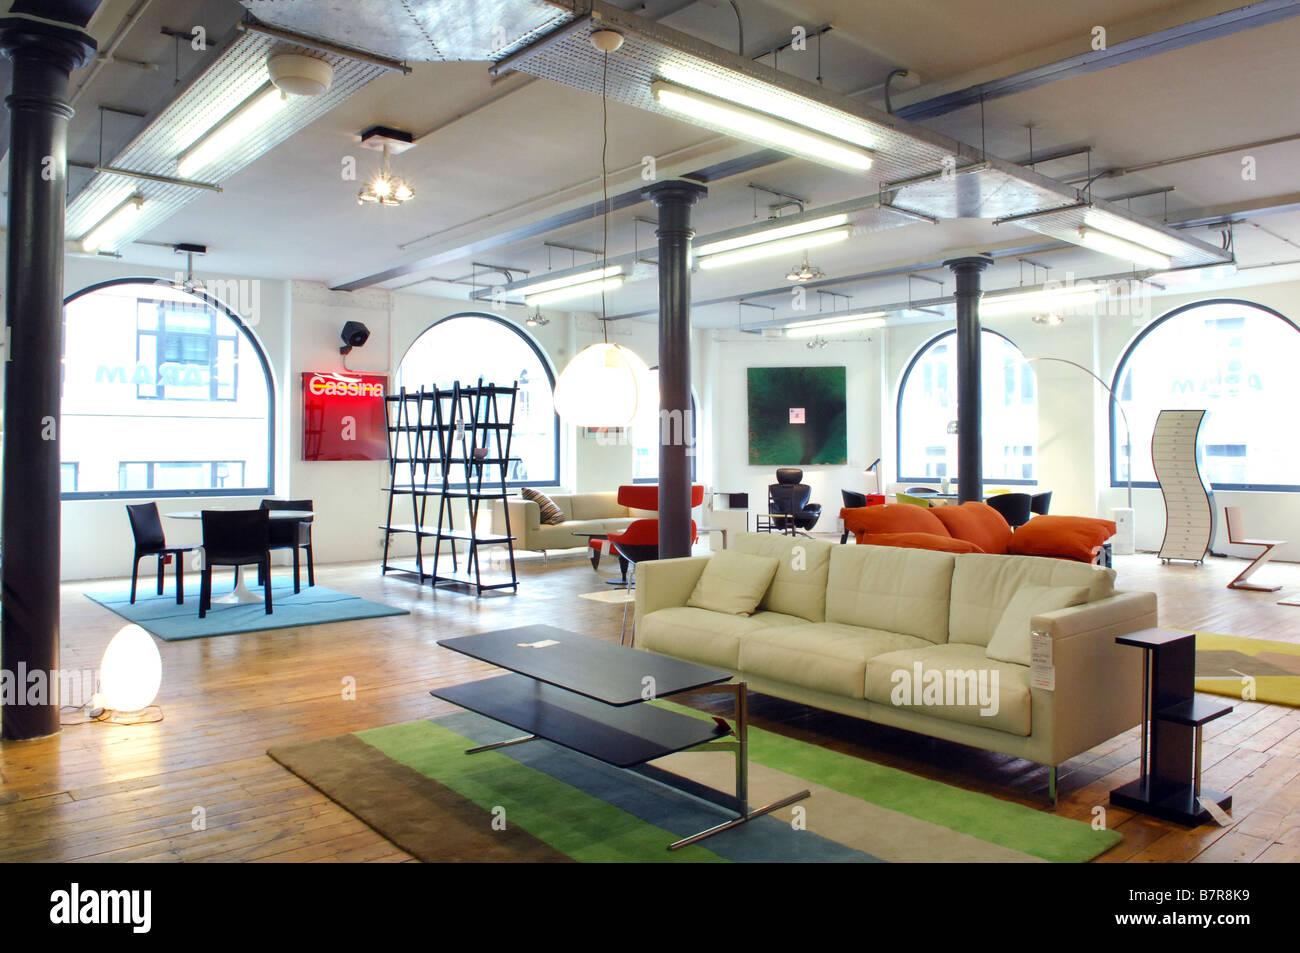 Furniture for sale in a designer furniture store stock photo craftsman furniture designer furniture stores